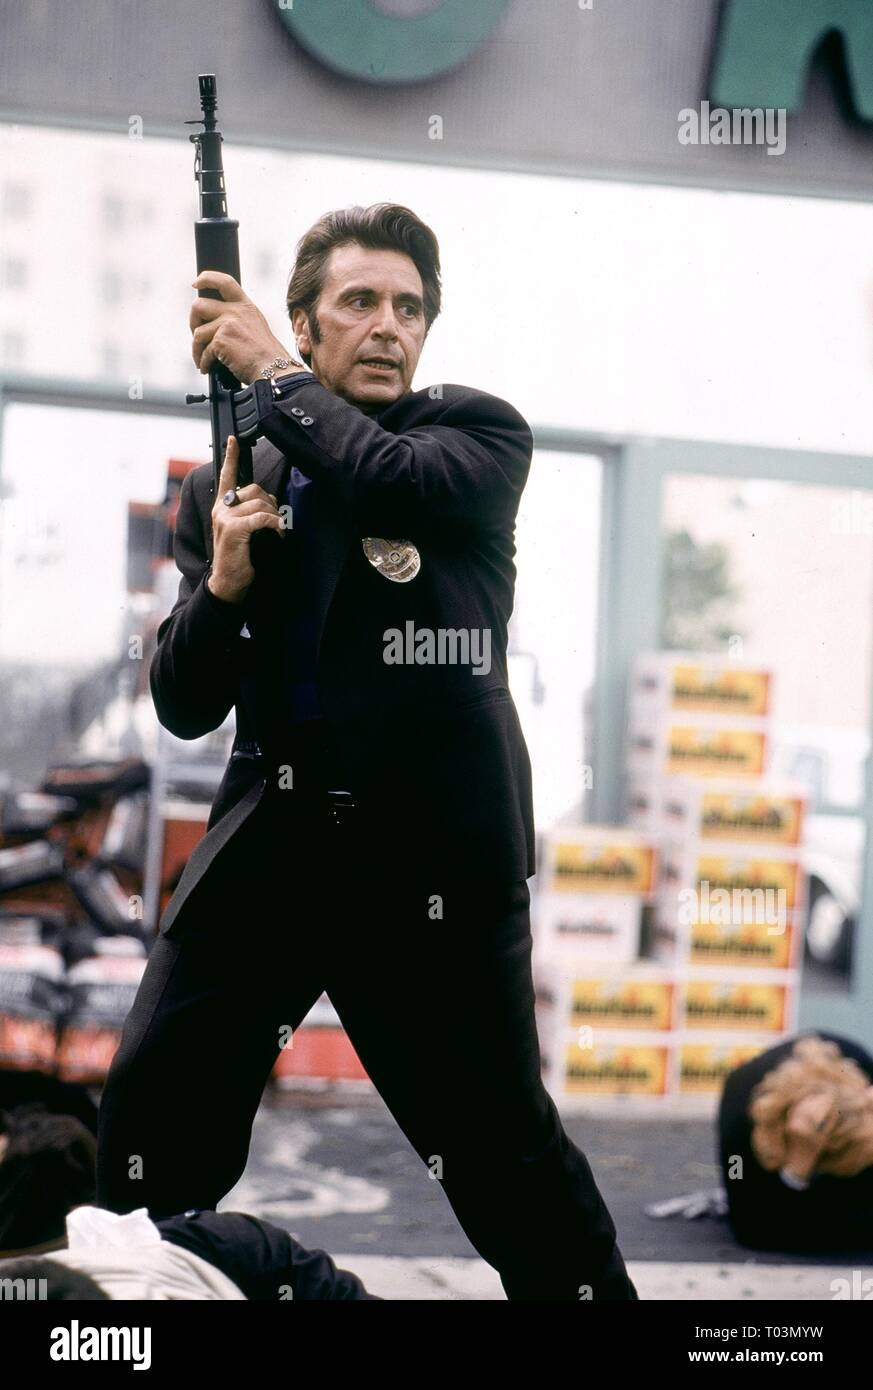 Al Pacino Heat 1995 Stock Photo Alamy